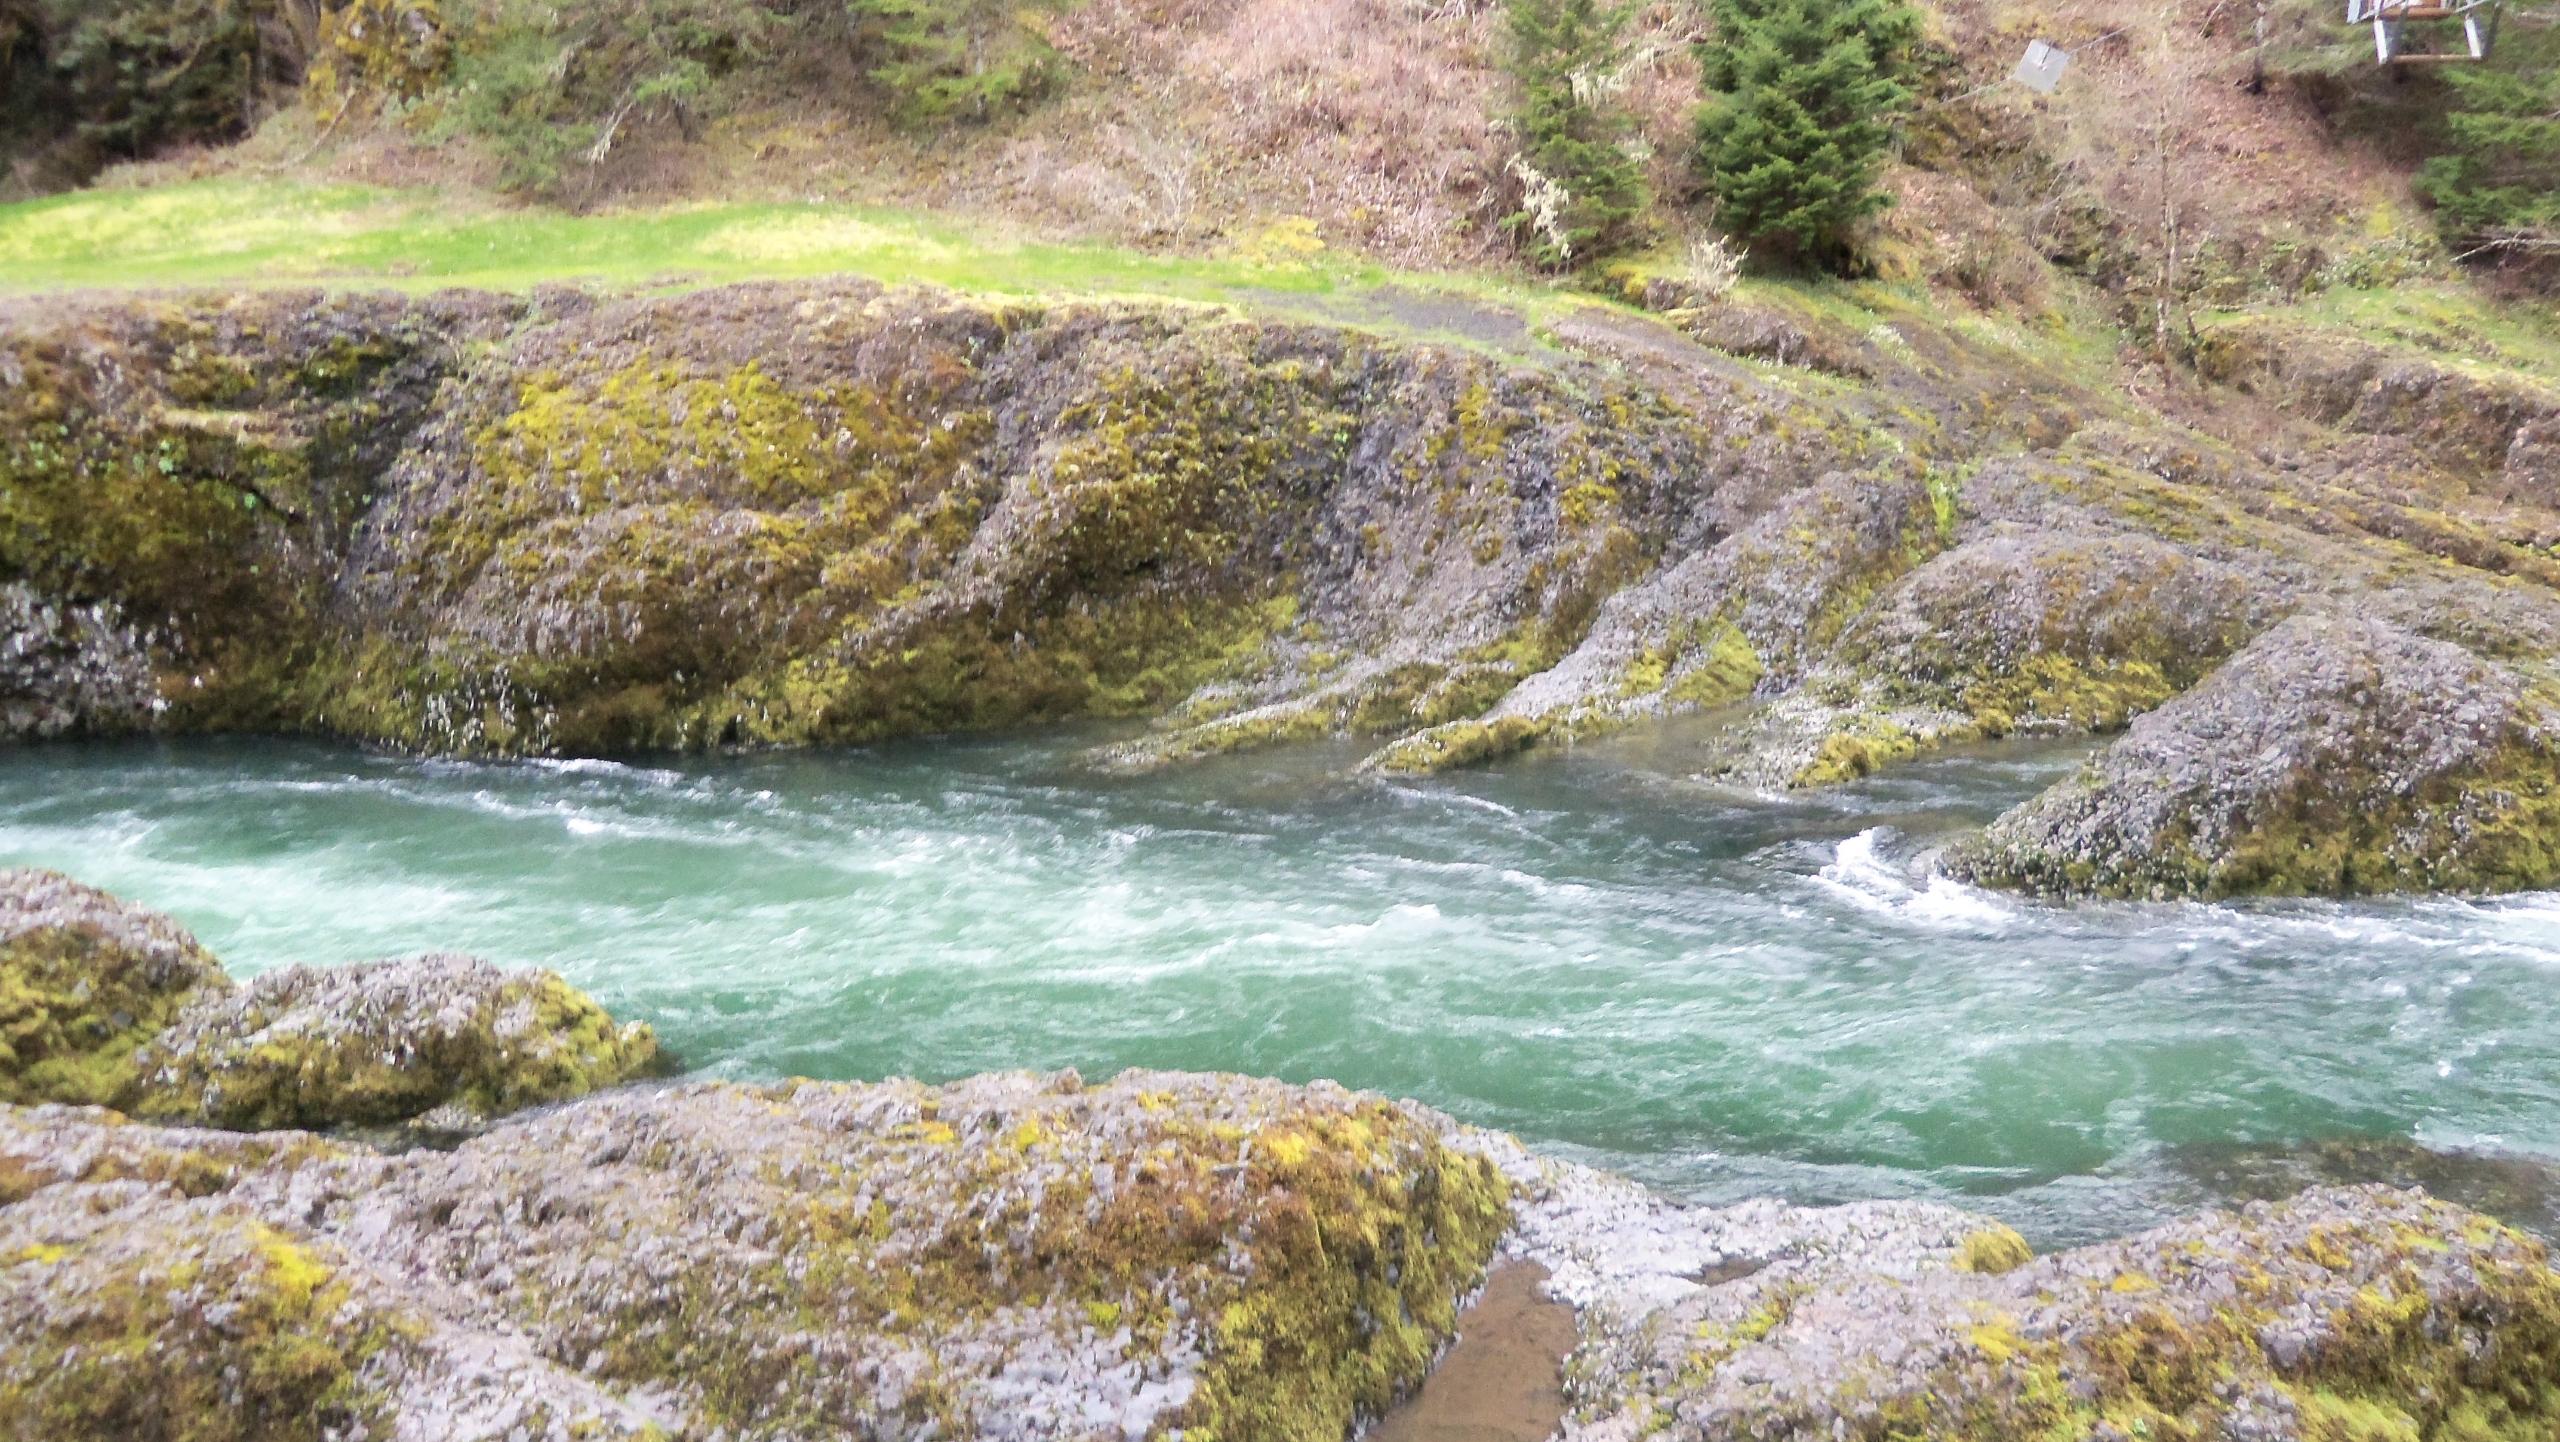 narrow section Clackamas River  - mrkz1000 | ello